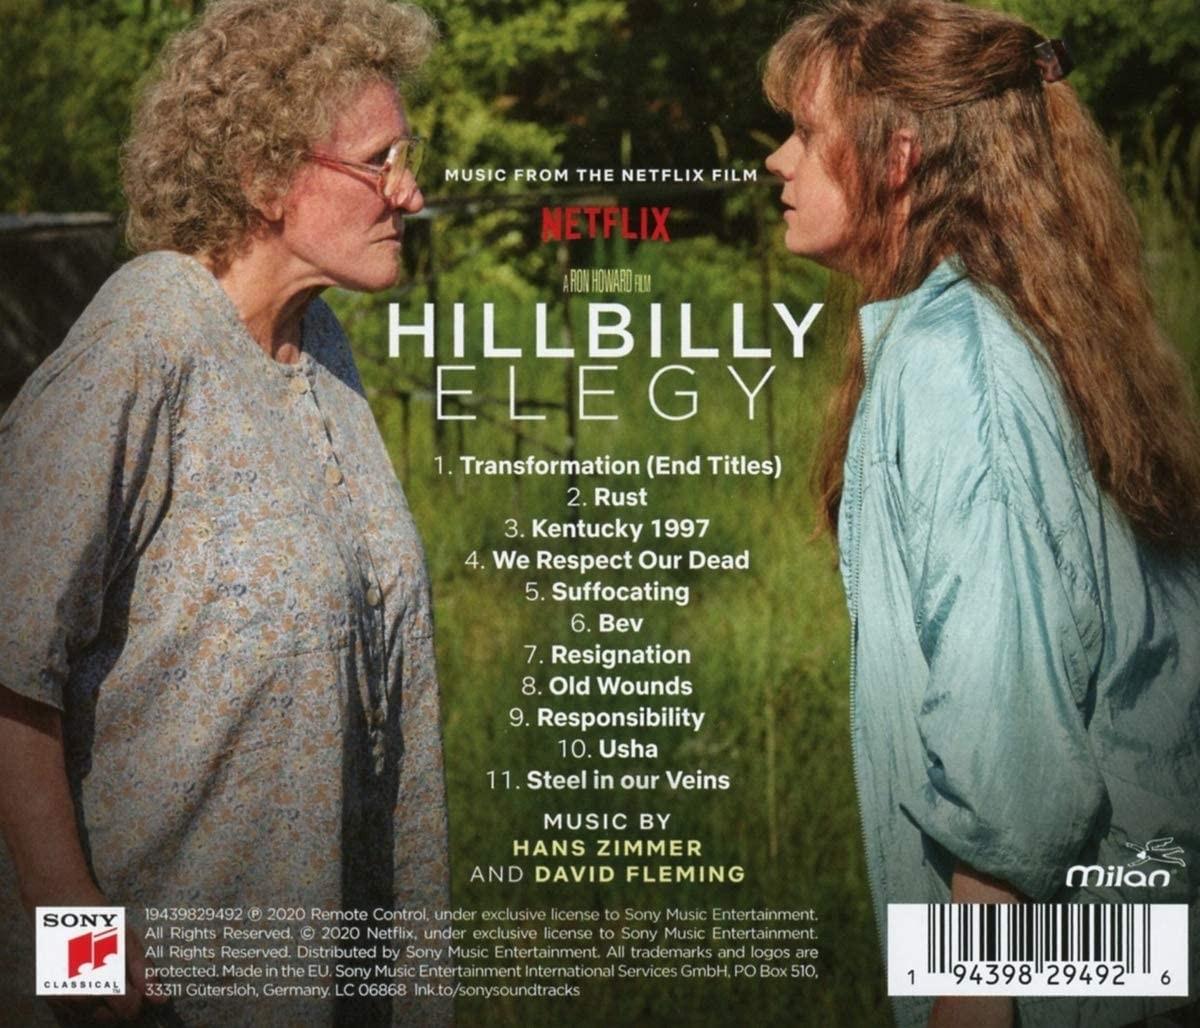 Hillbilly Elegy - okładka soundtracku CD (tył)